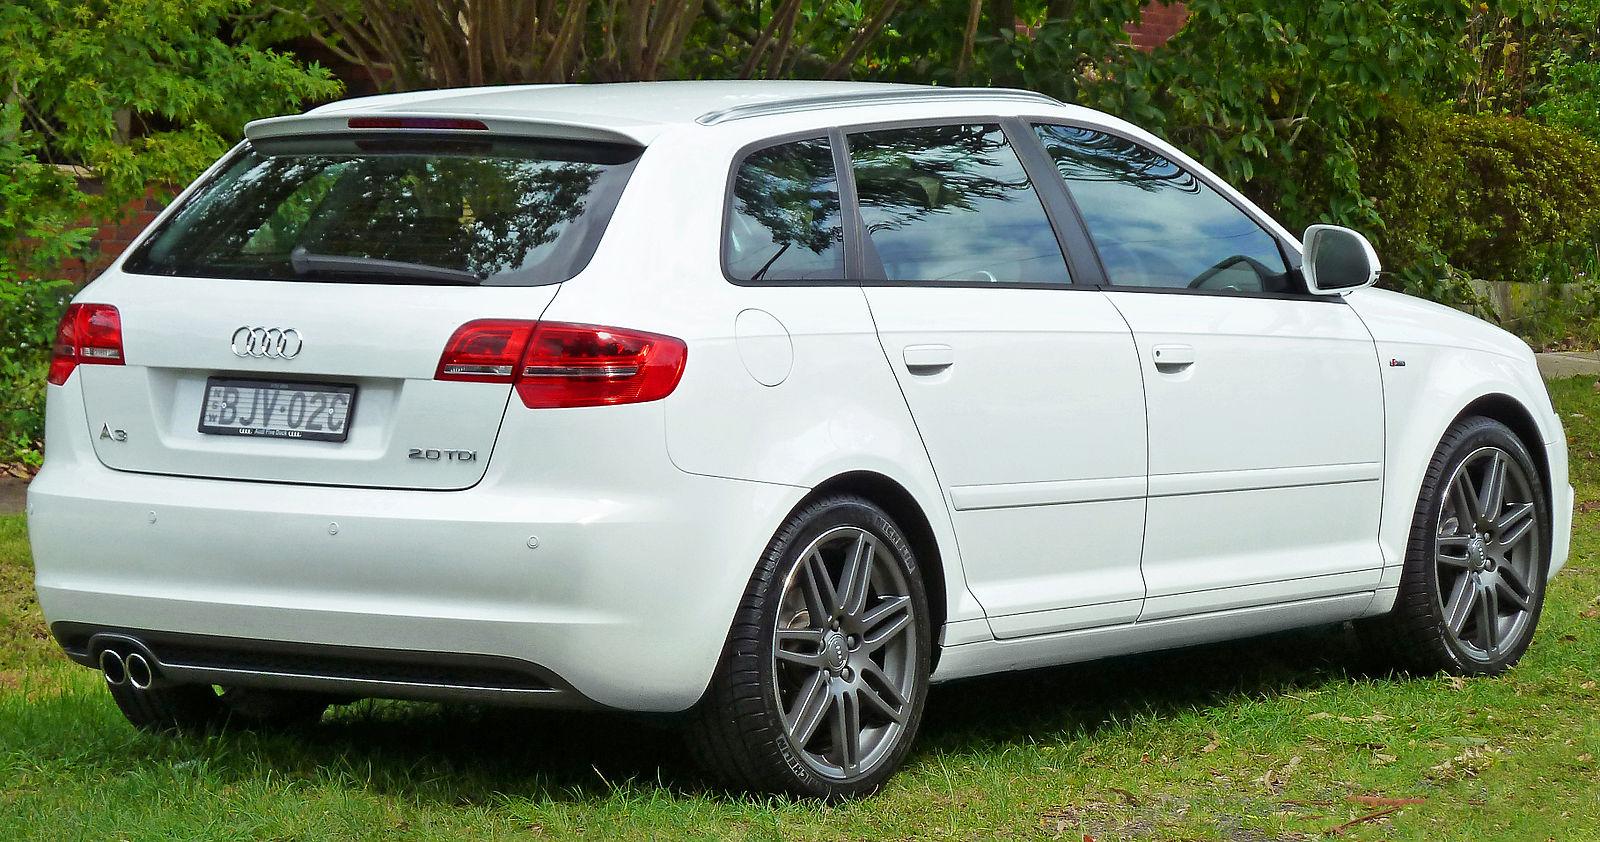 2009_Audi_A3_(8PA)_2.0_TDI_5-door_Sportback_(2011-04-02)_02